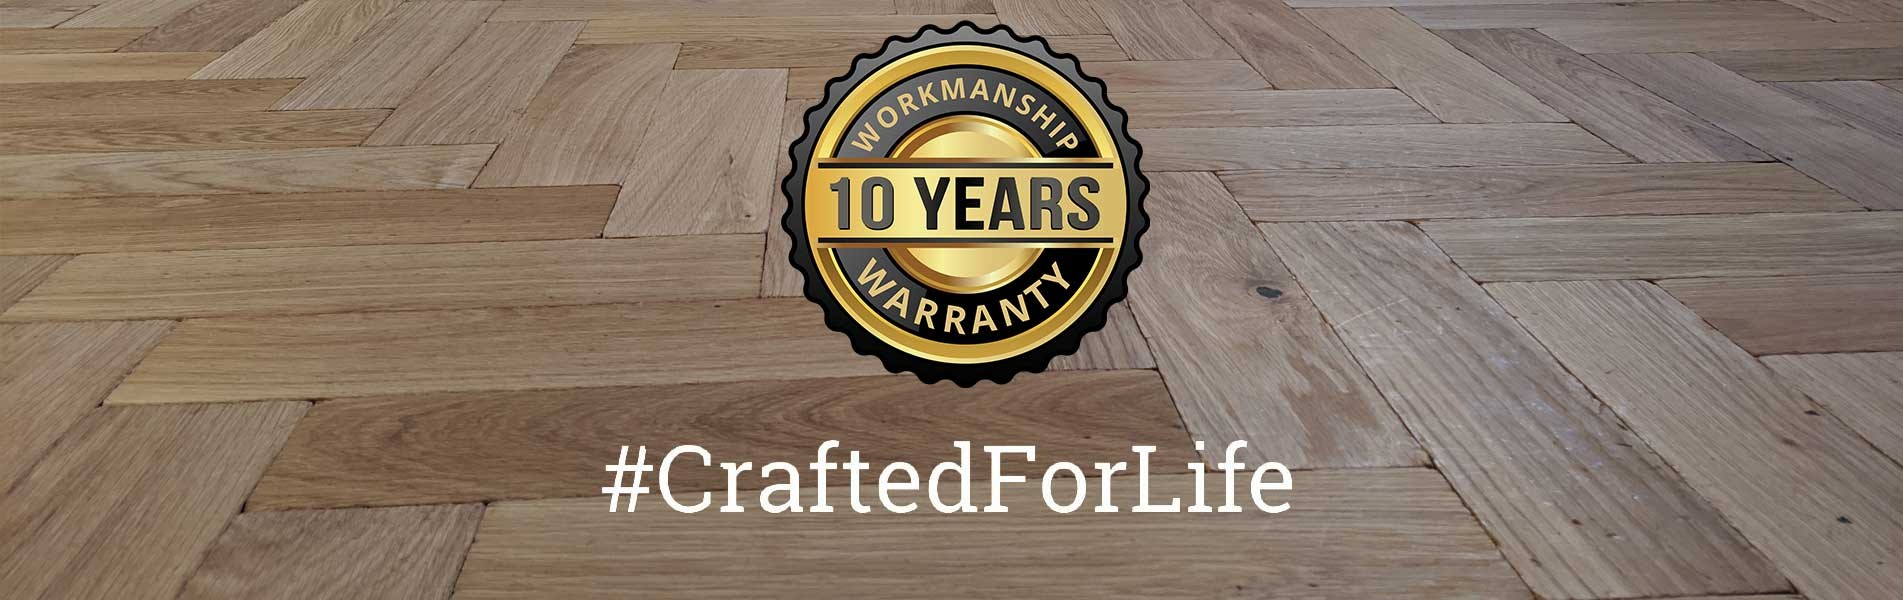 10-Years-Waranty